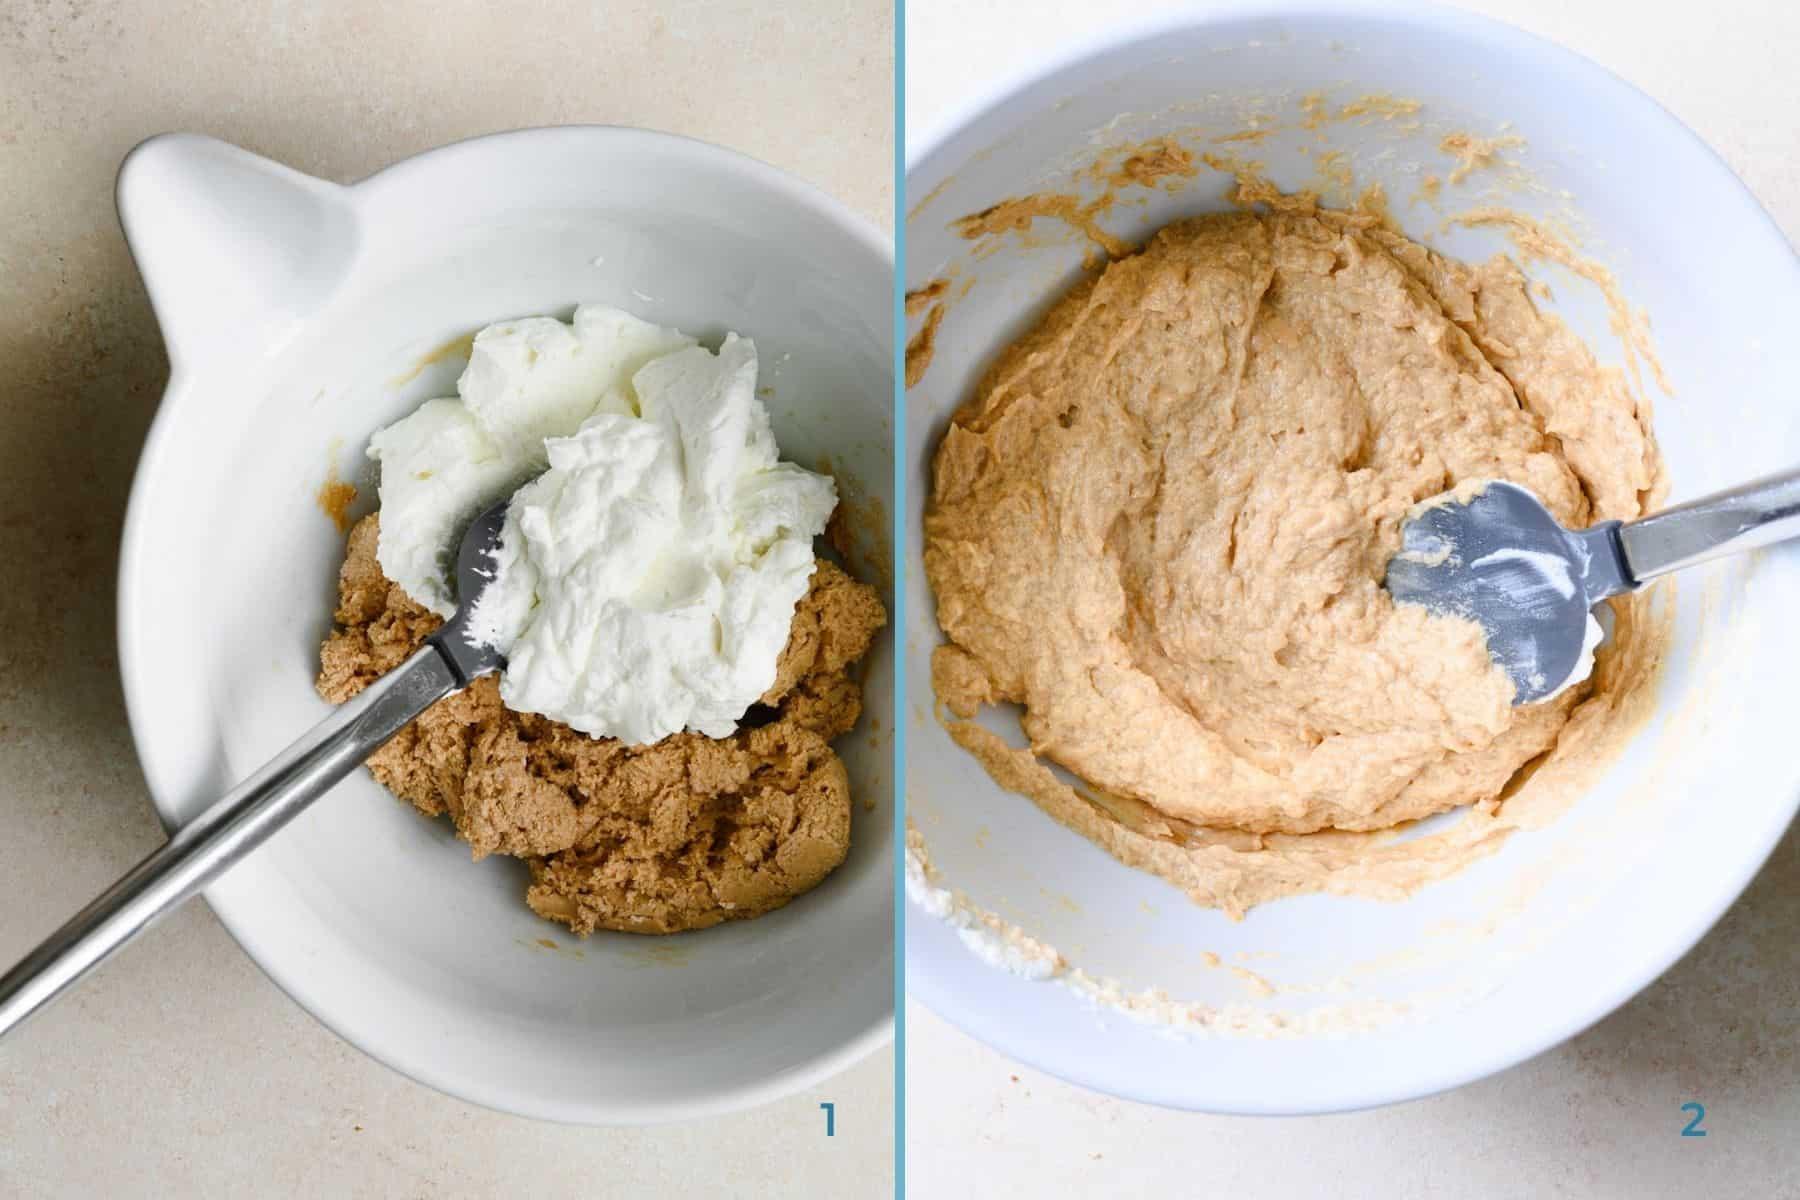 process shots to make peanut butter mousse